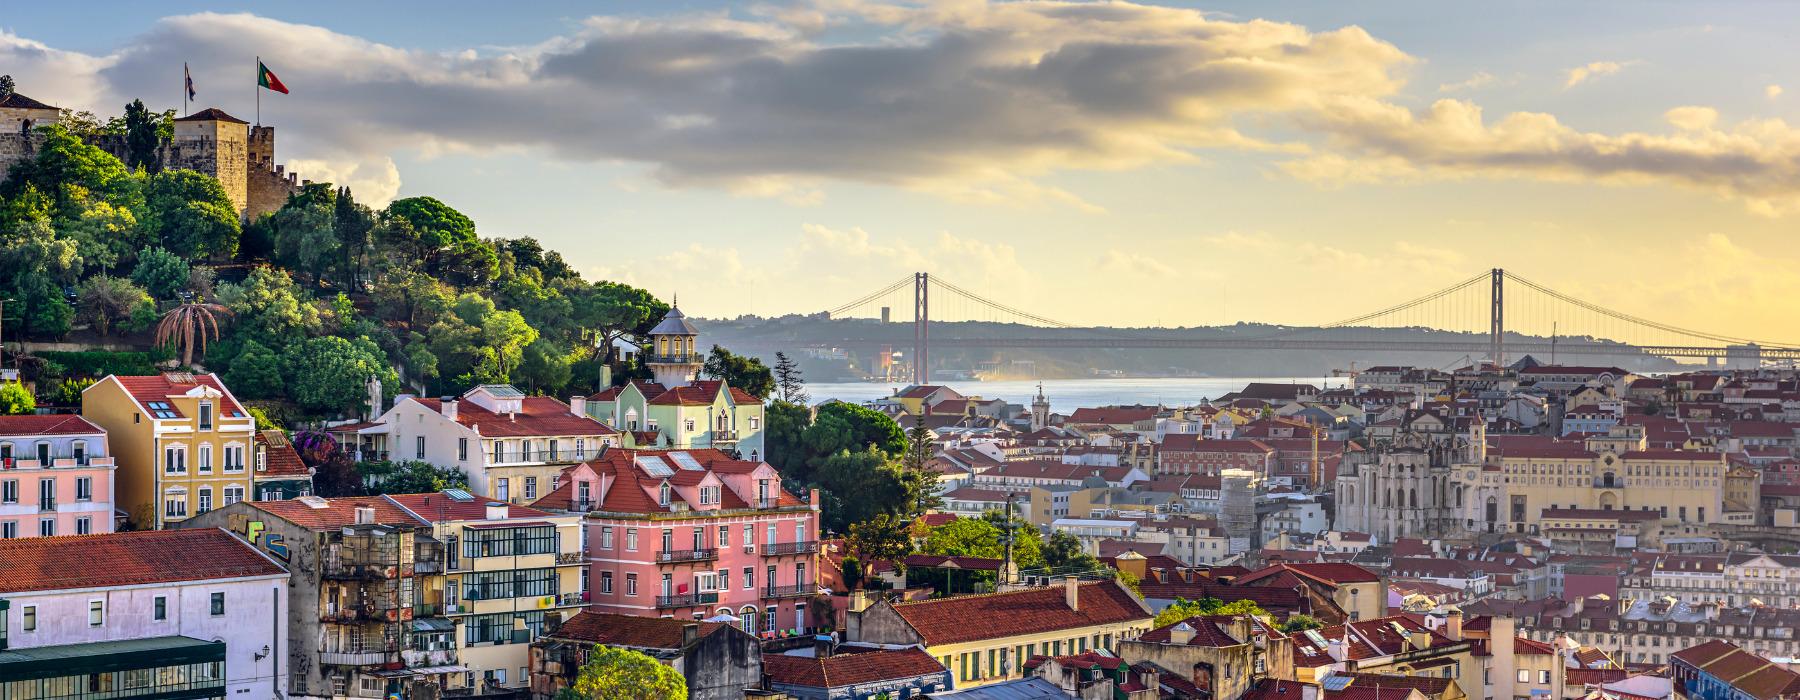 Lisbona, frontiera d'Europa